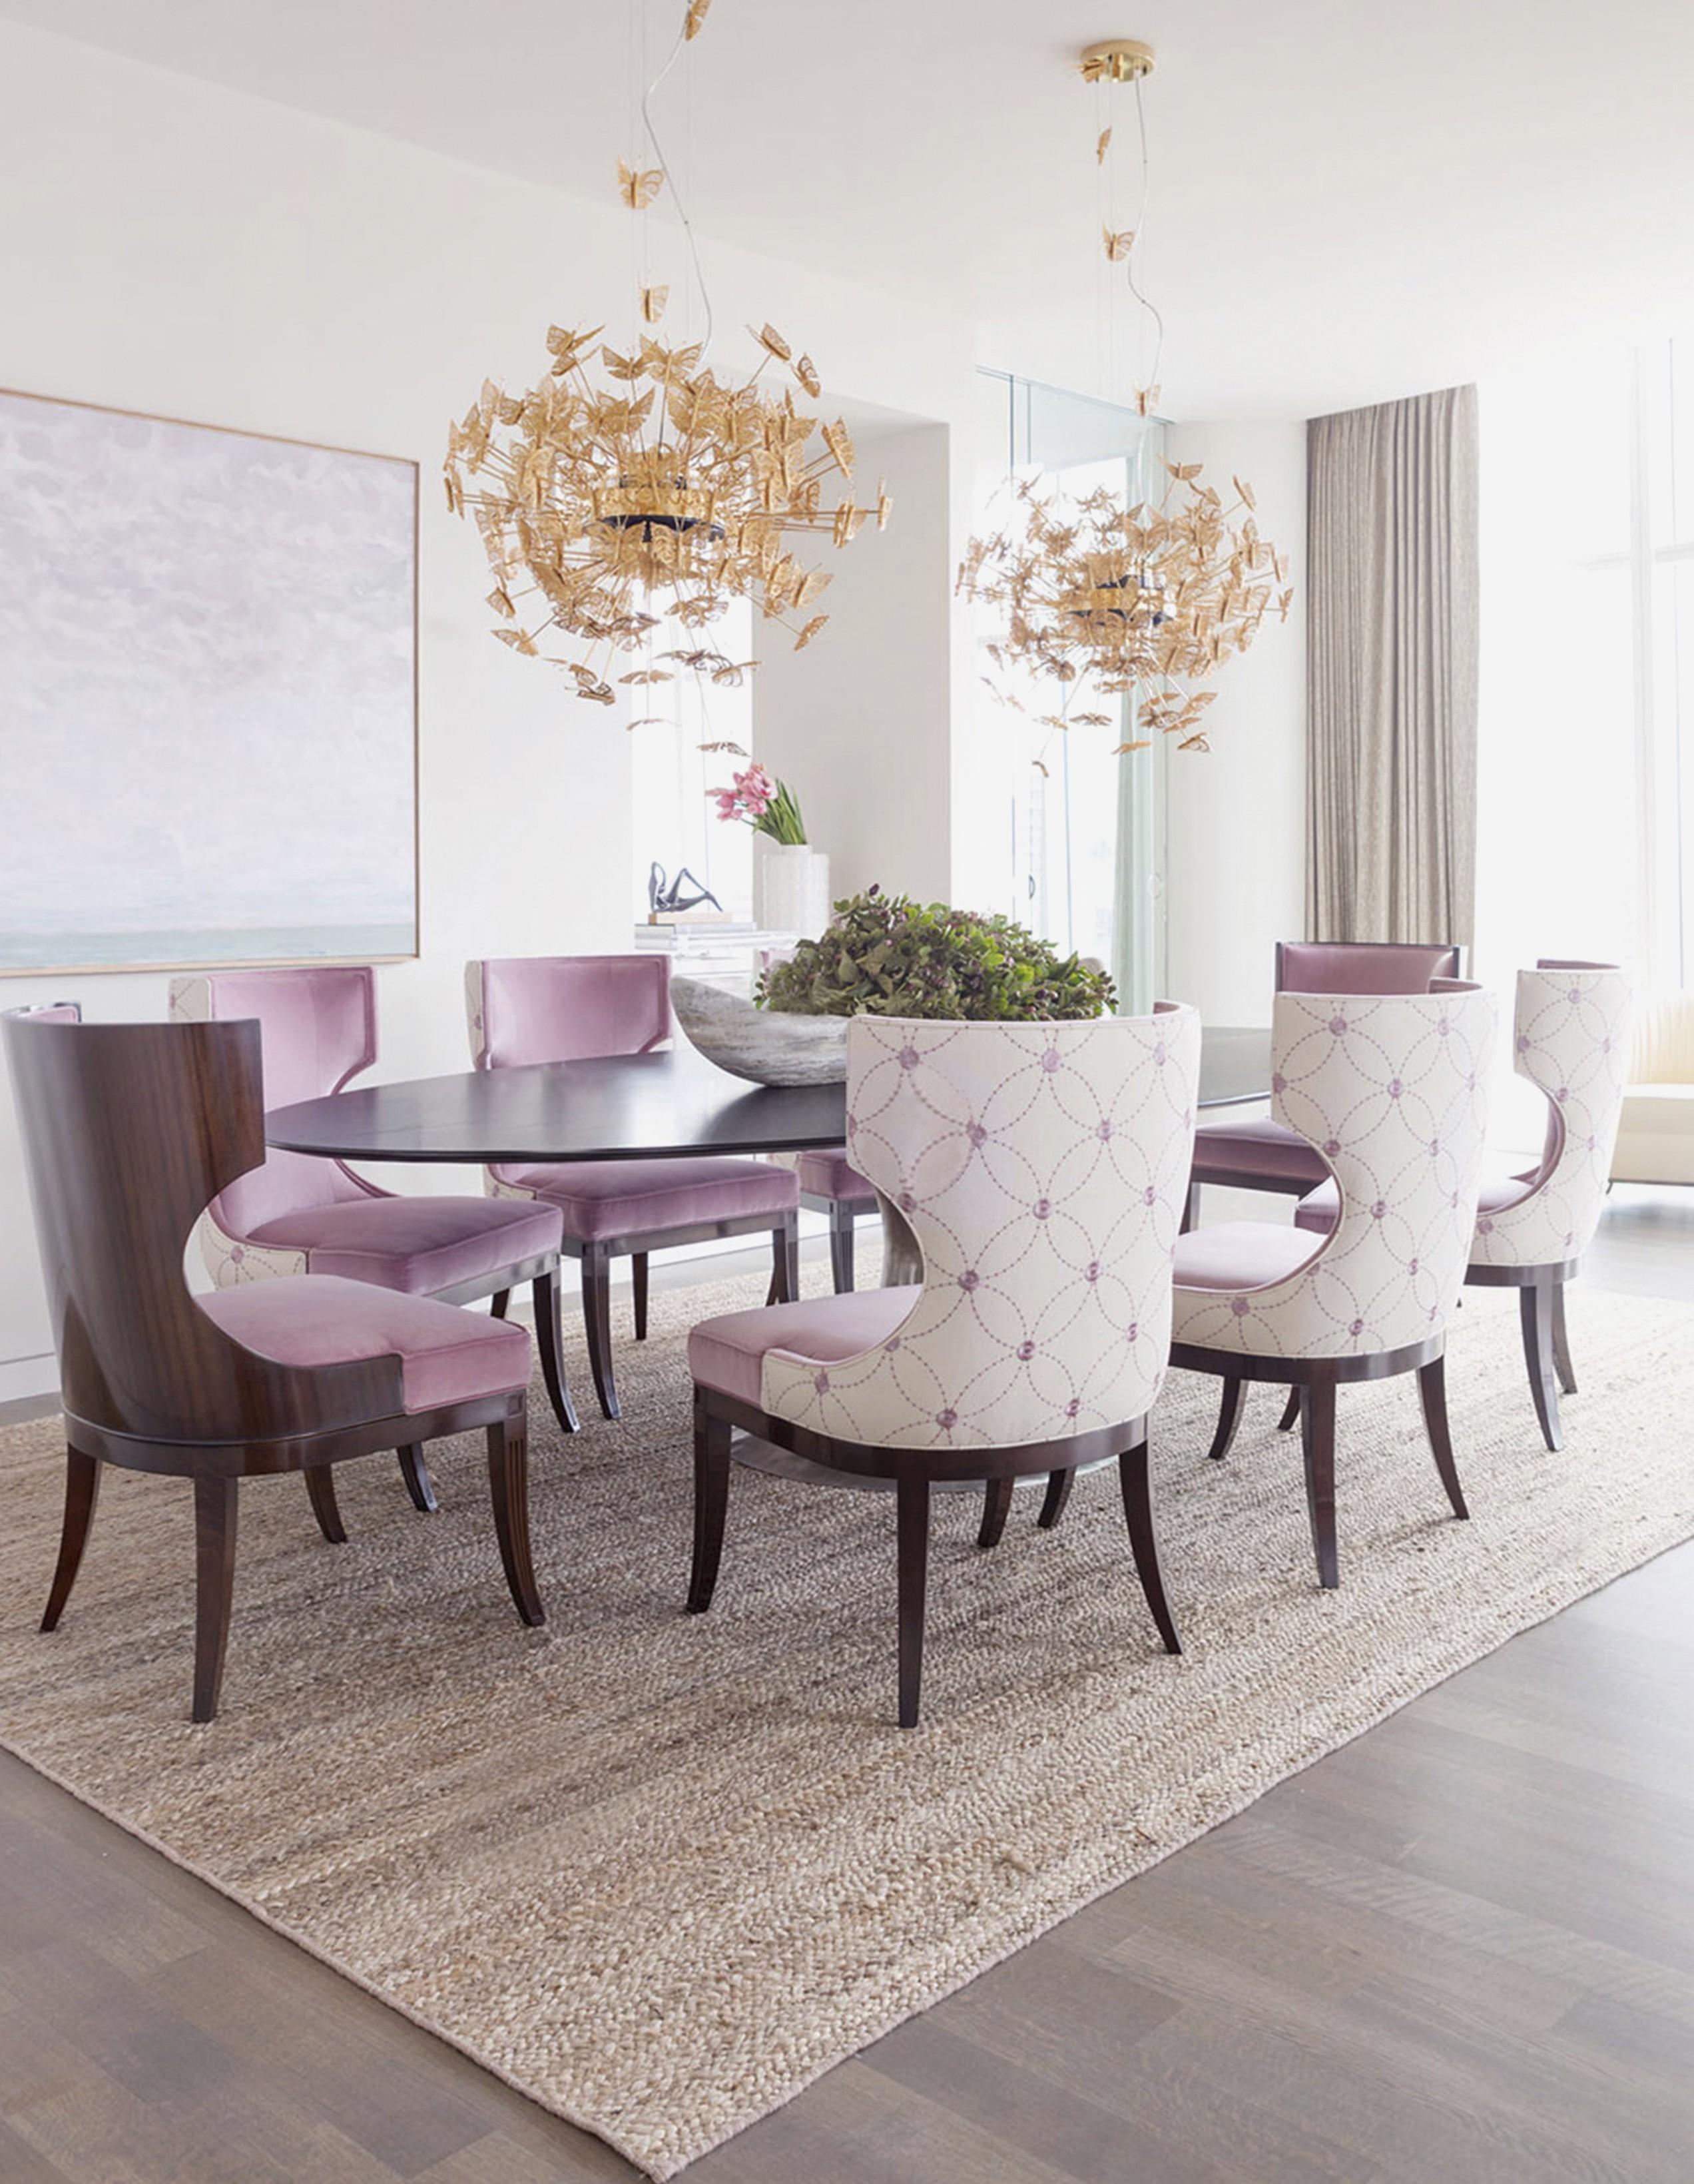 decoration salle a manger rose fauteuil